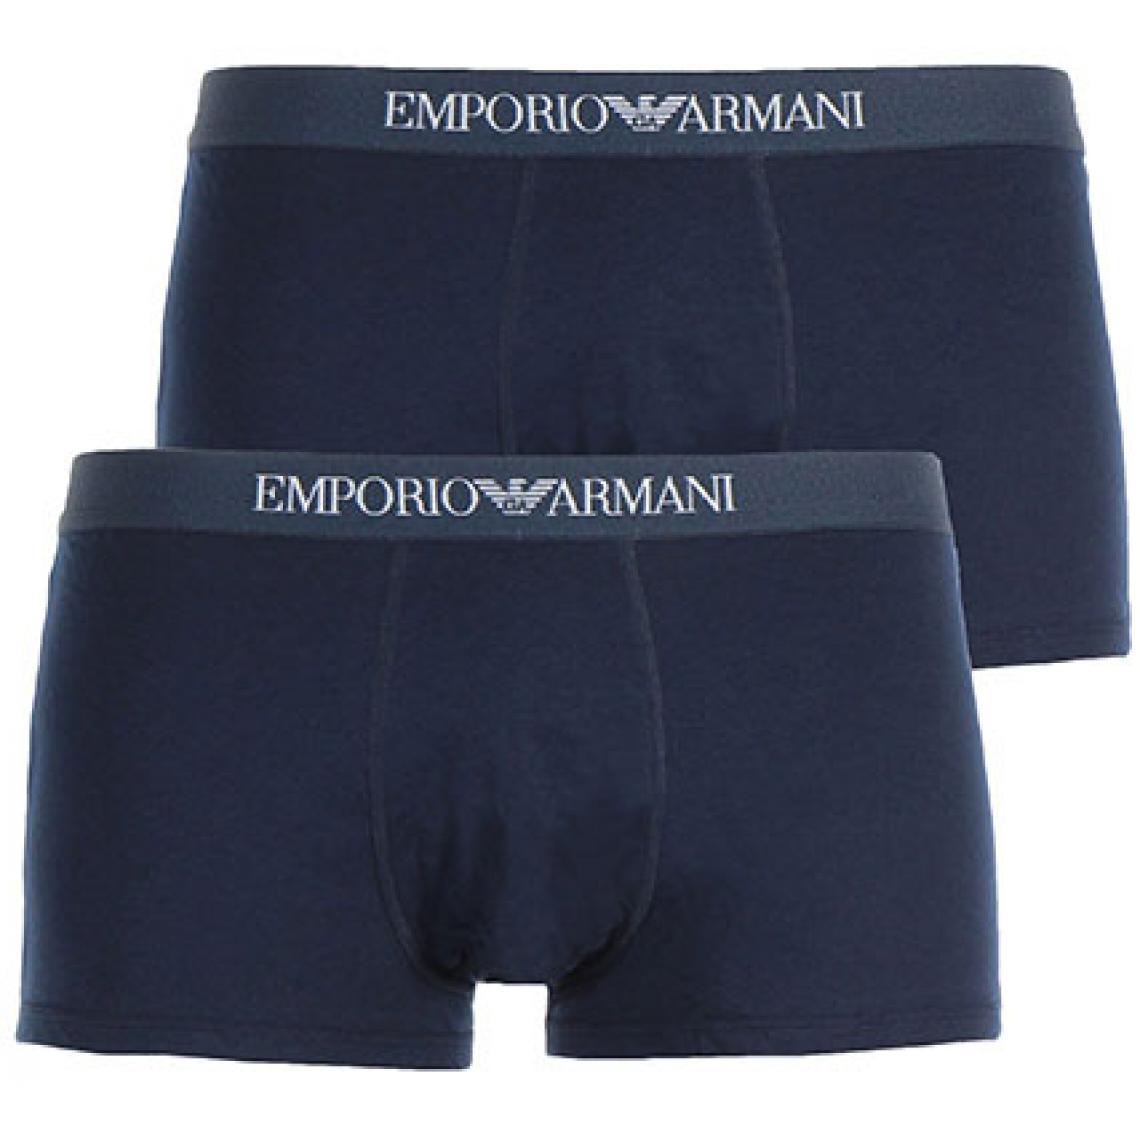 Pack de 2 boxers ceinture élastique - coton - Emporio Armani Underwear - Modalova